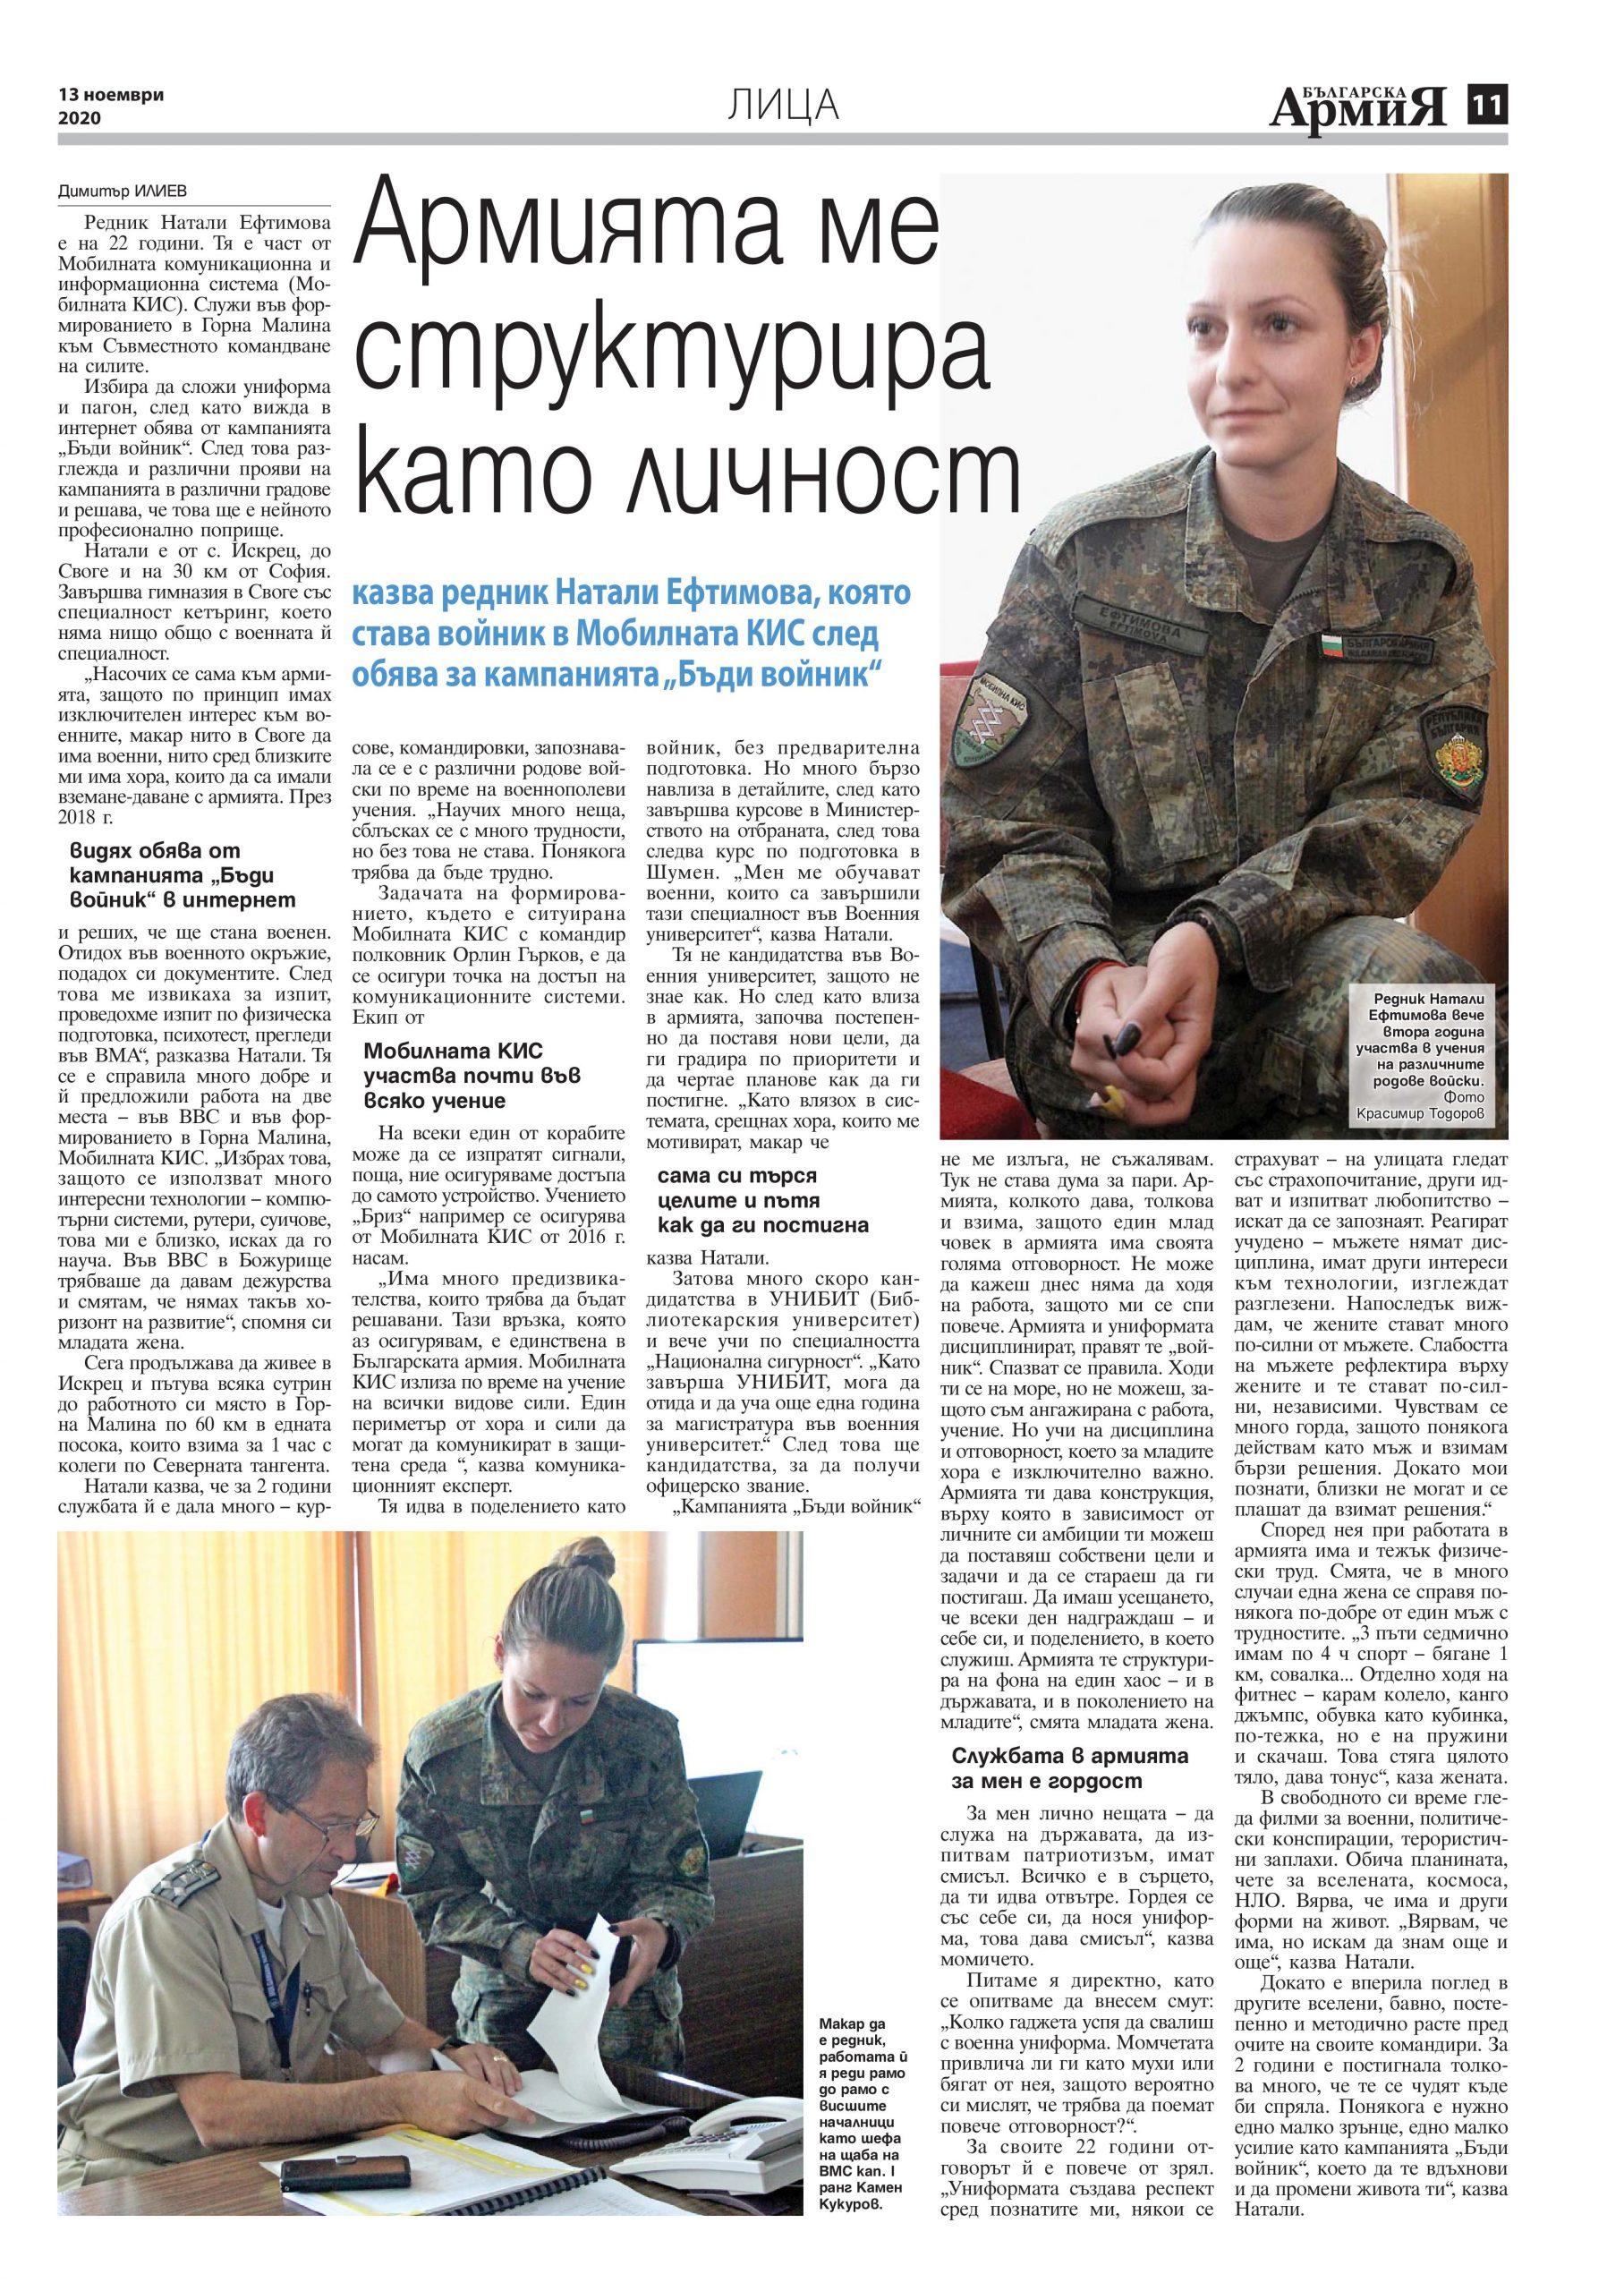 https://armymedia.bg/wp-content/uploads/2015/06/11-48-scaled.jpg